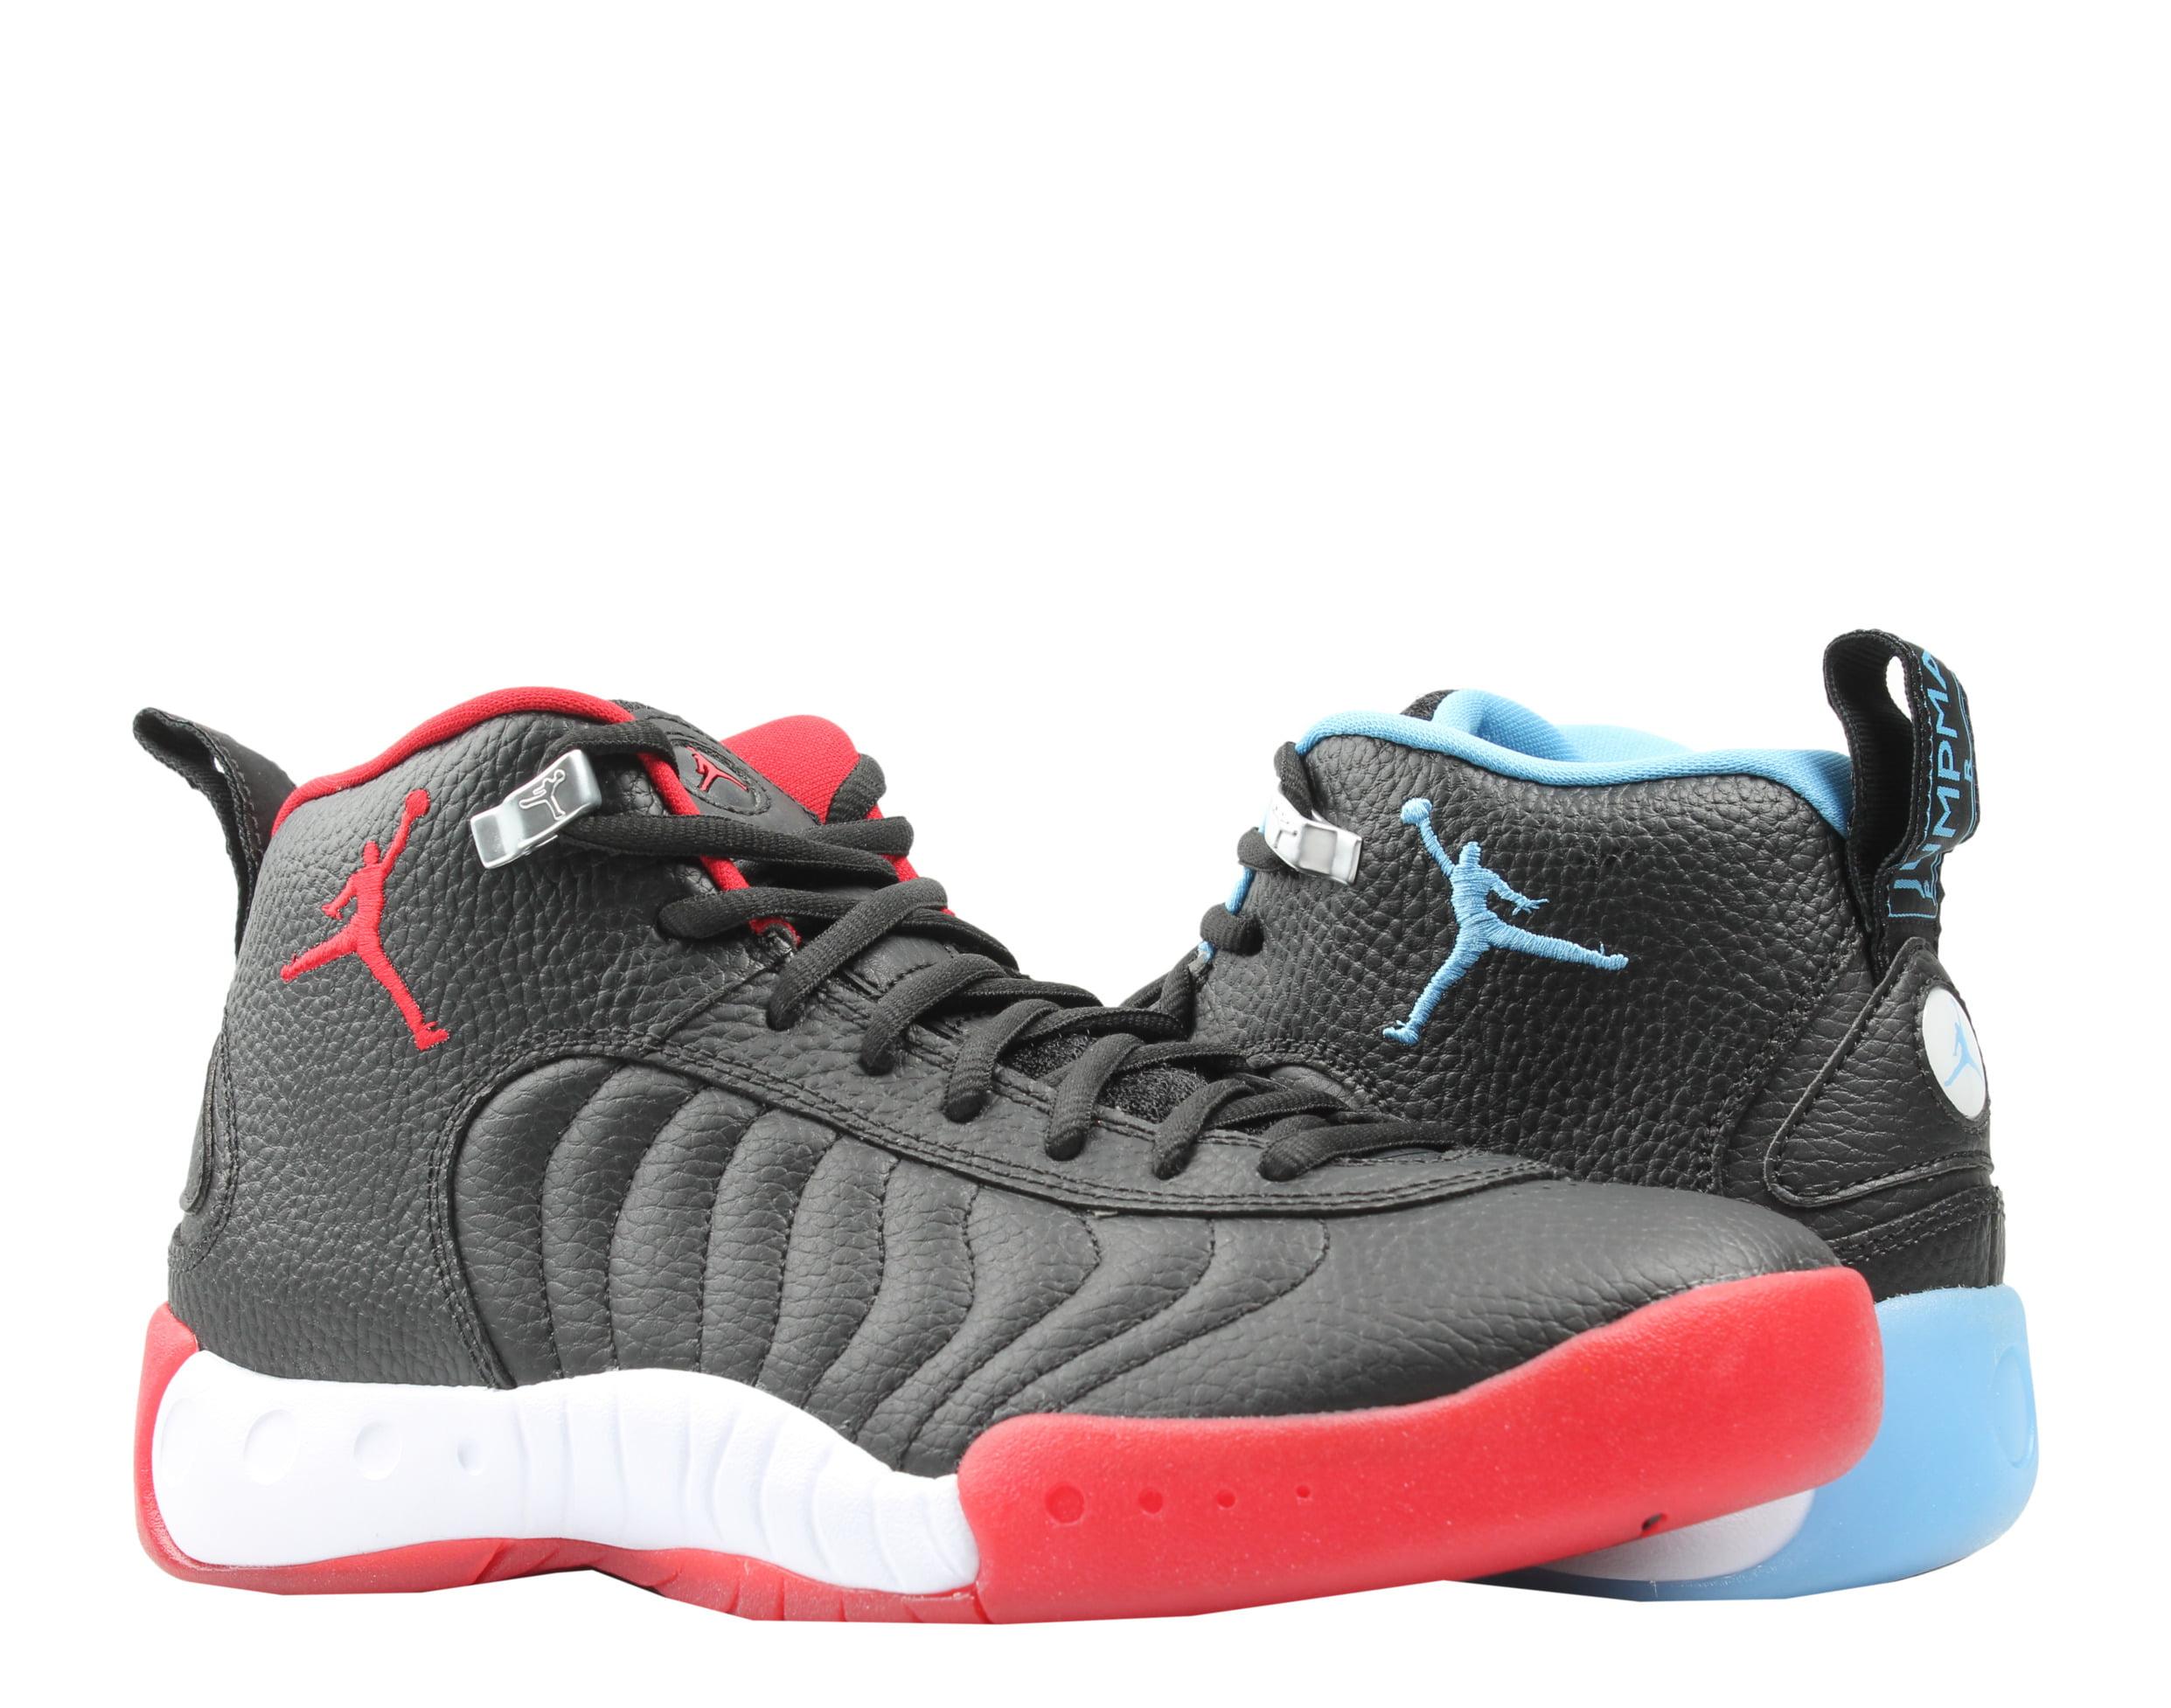 Nike Air Jordan Jumpman Pro Black/Red-Blue Men's Basketball Shoes CK0009-001